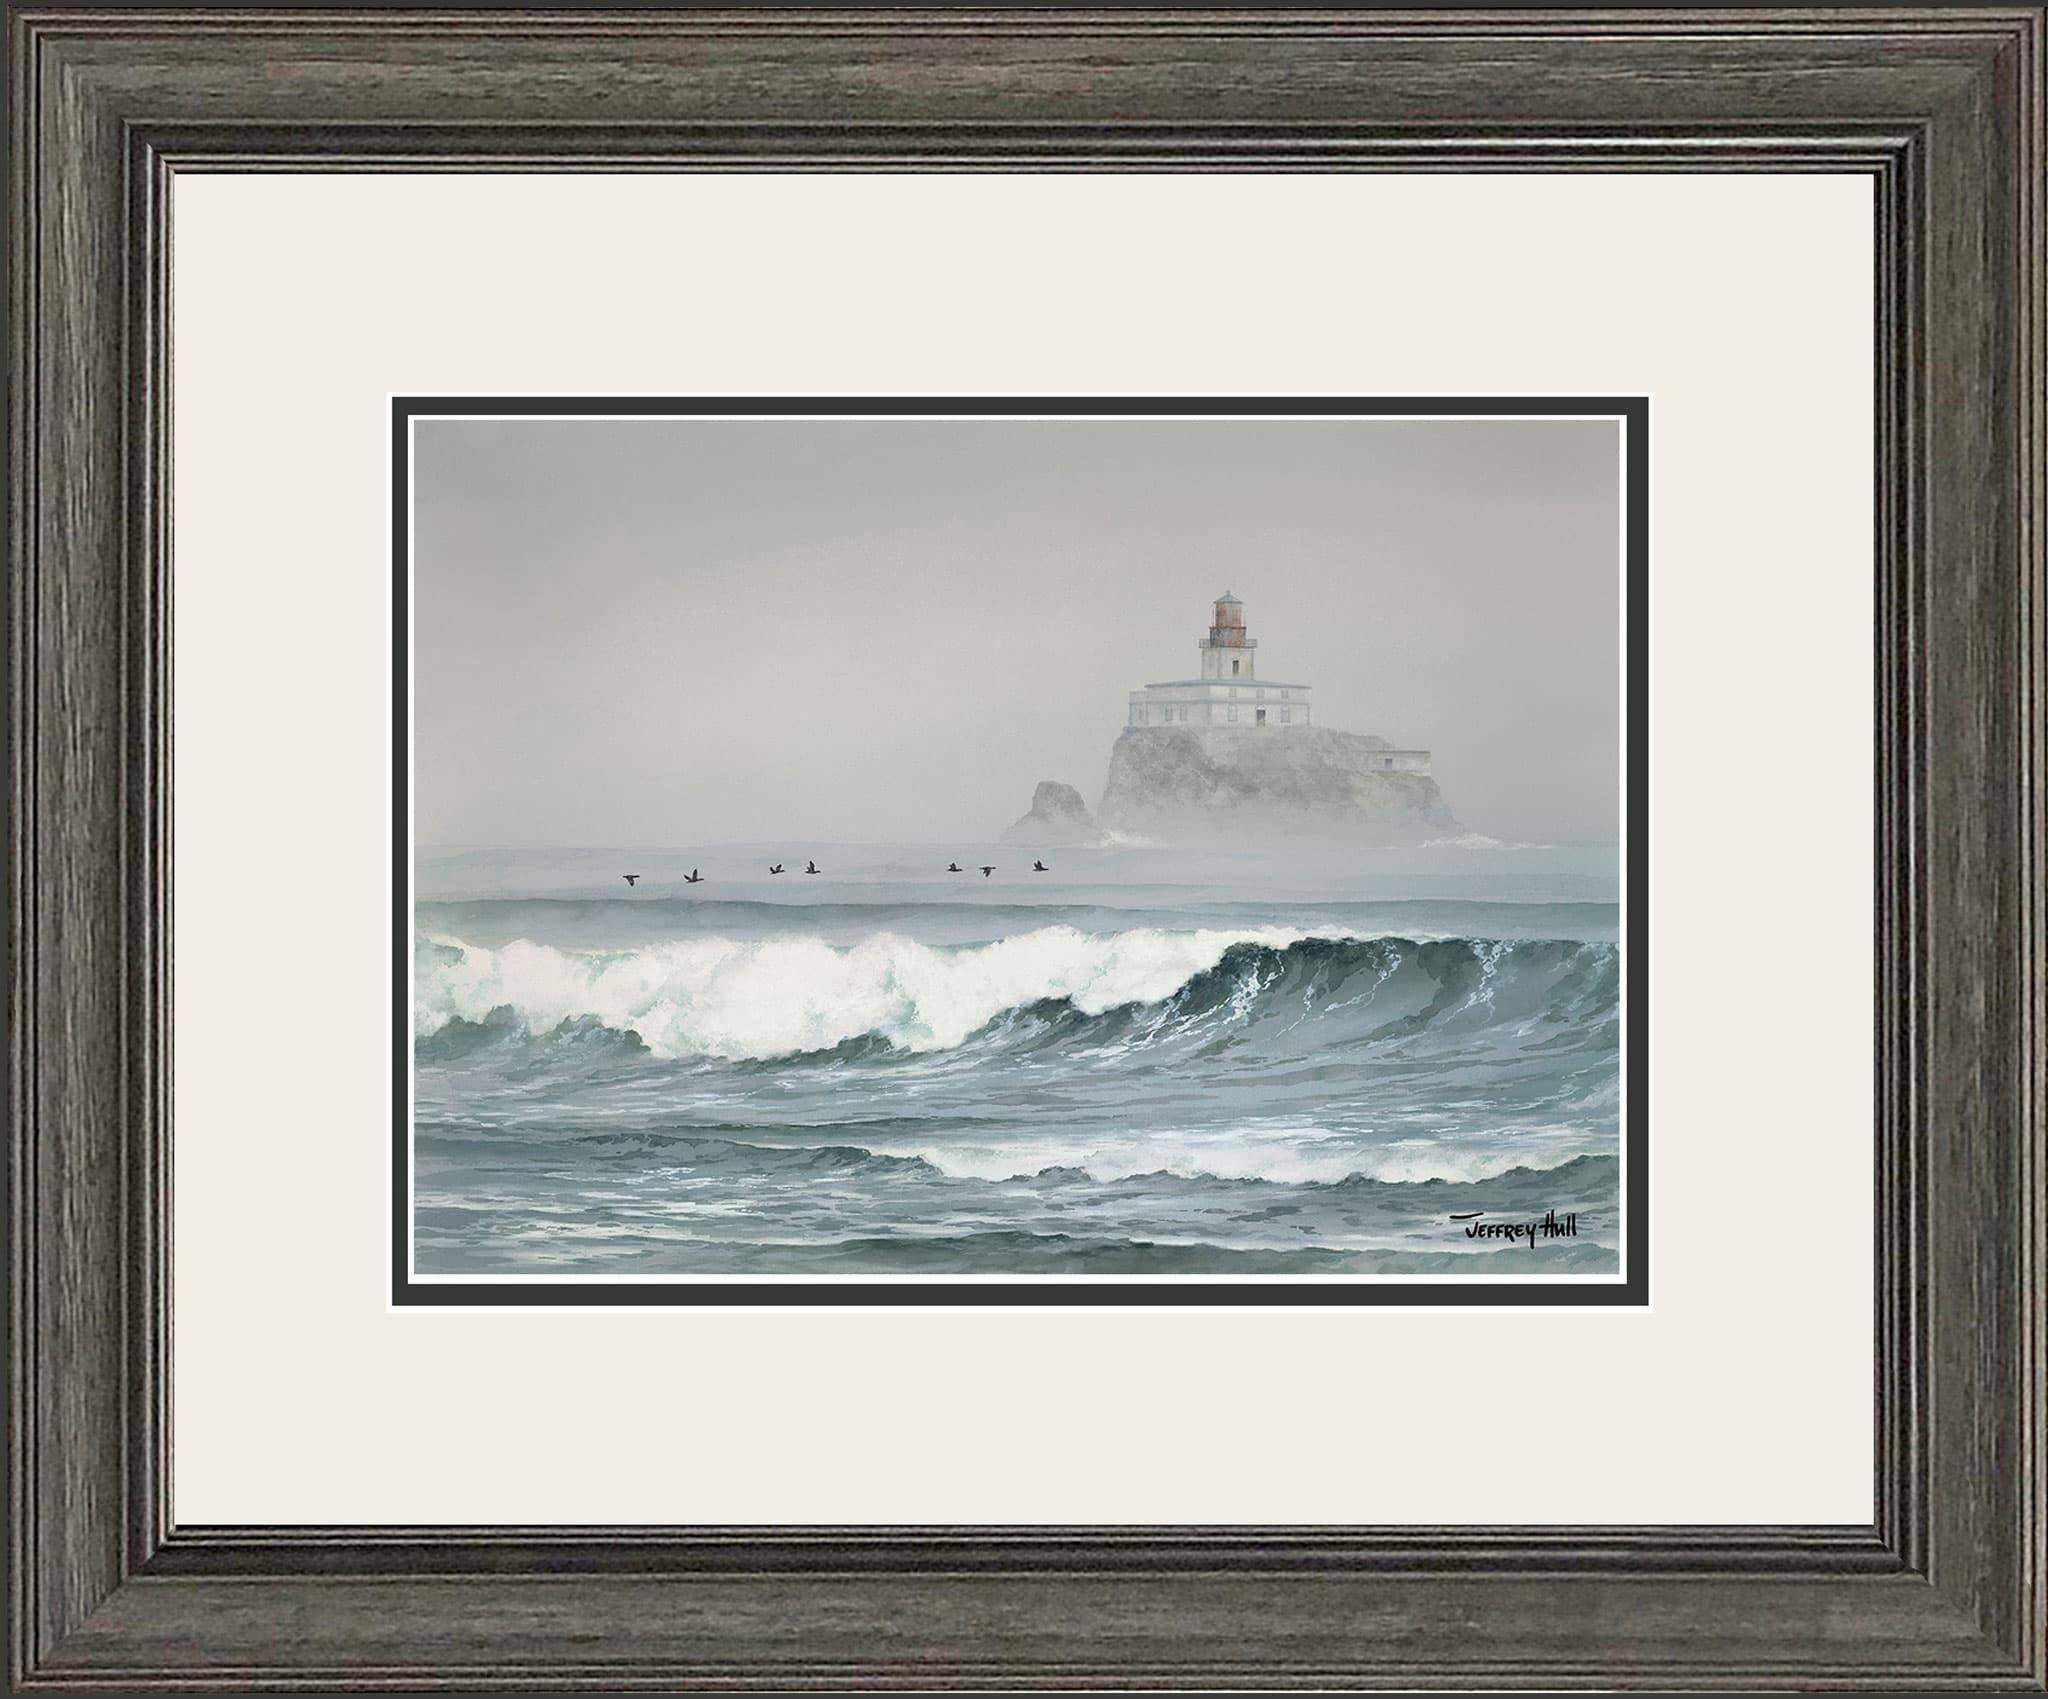 Tillamook-Rock-Lighthouse-OpenEd-Cascade-Talc-Dark-Shale-4-Website-2021